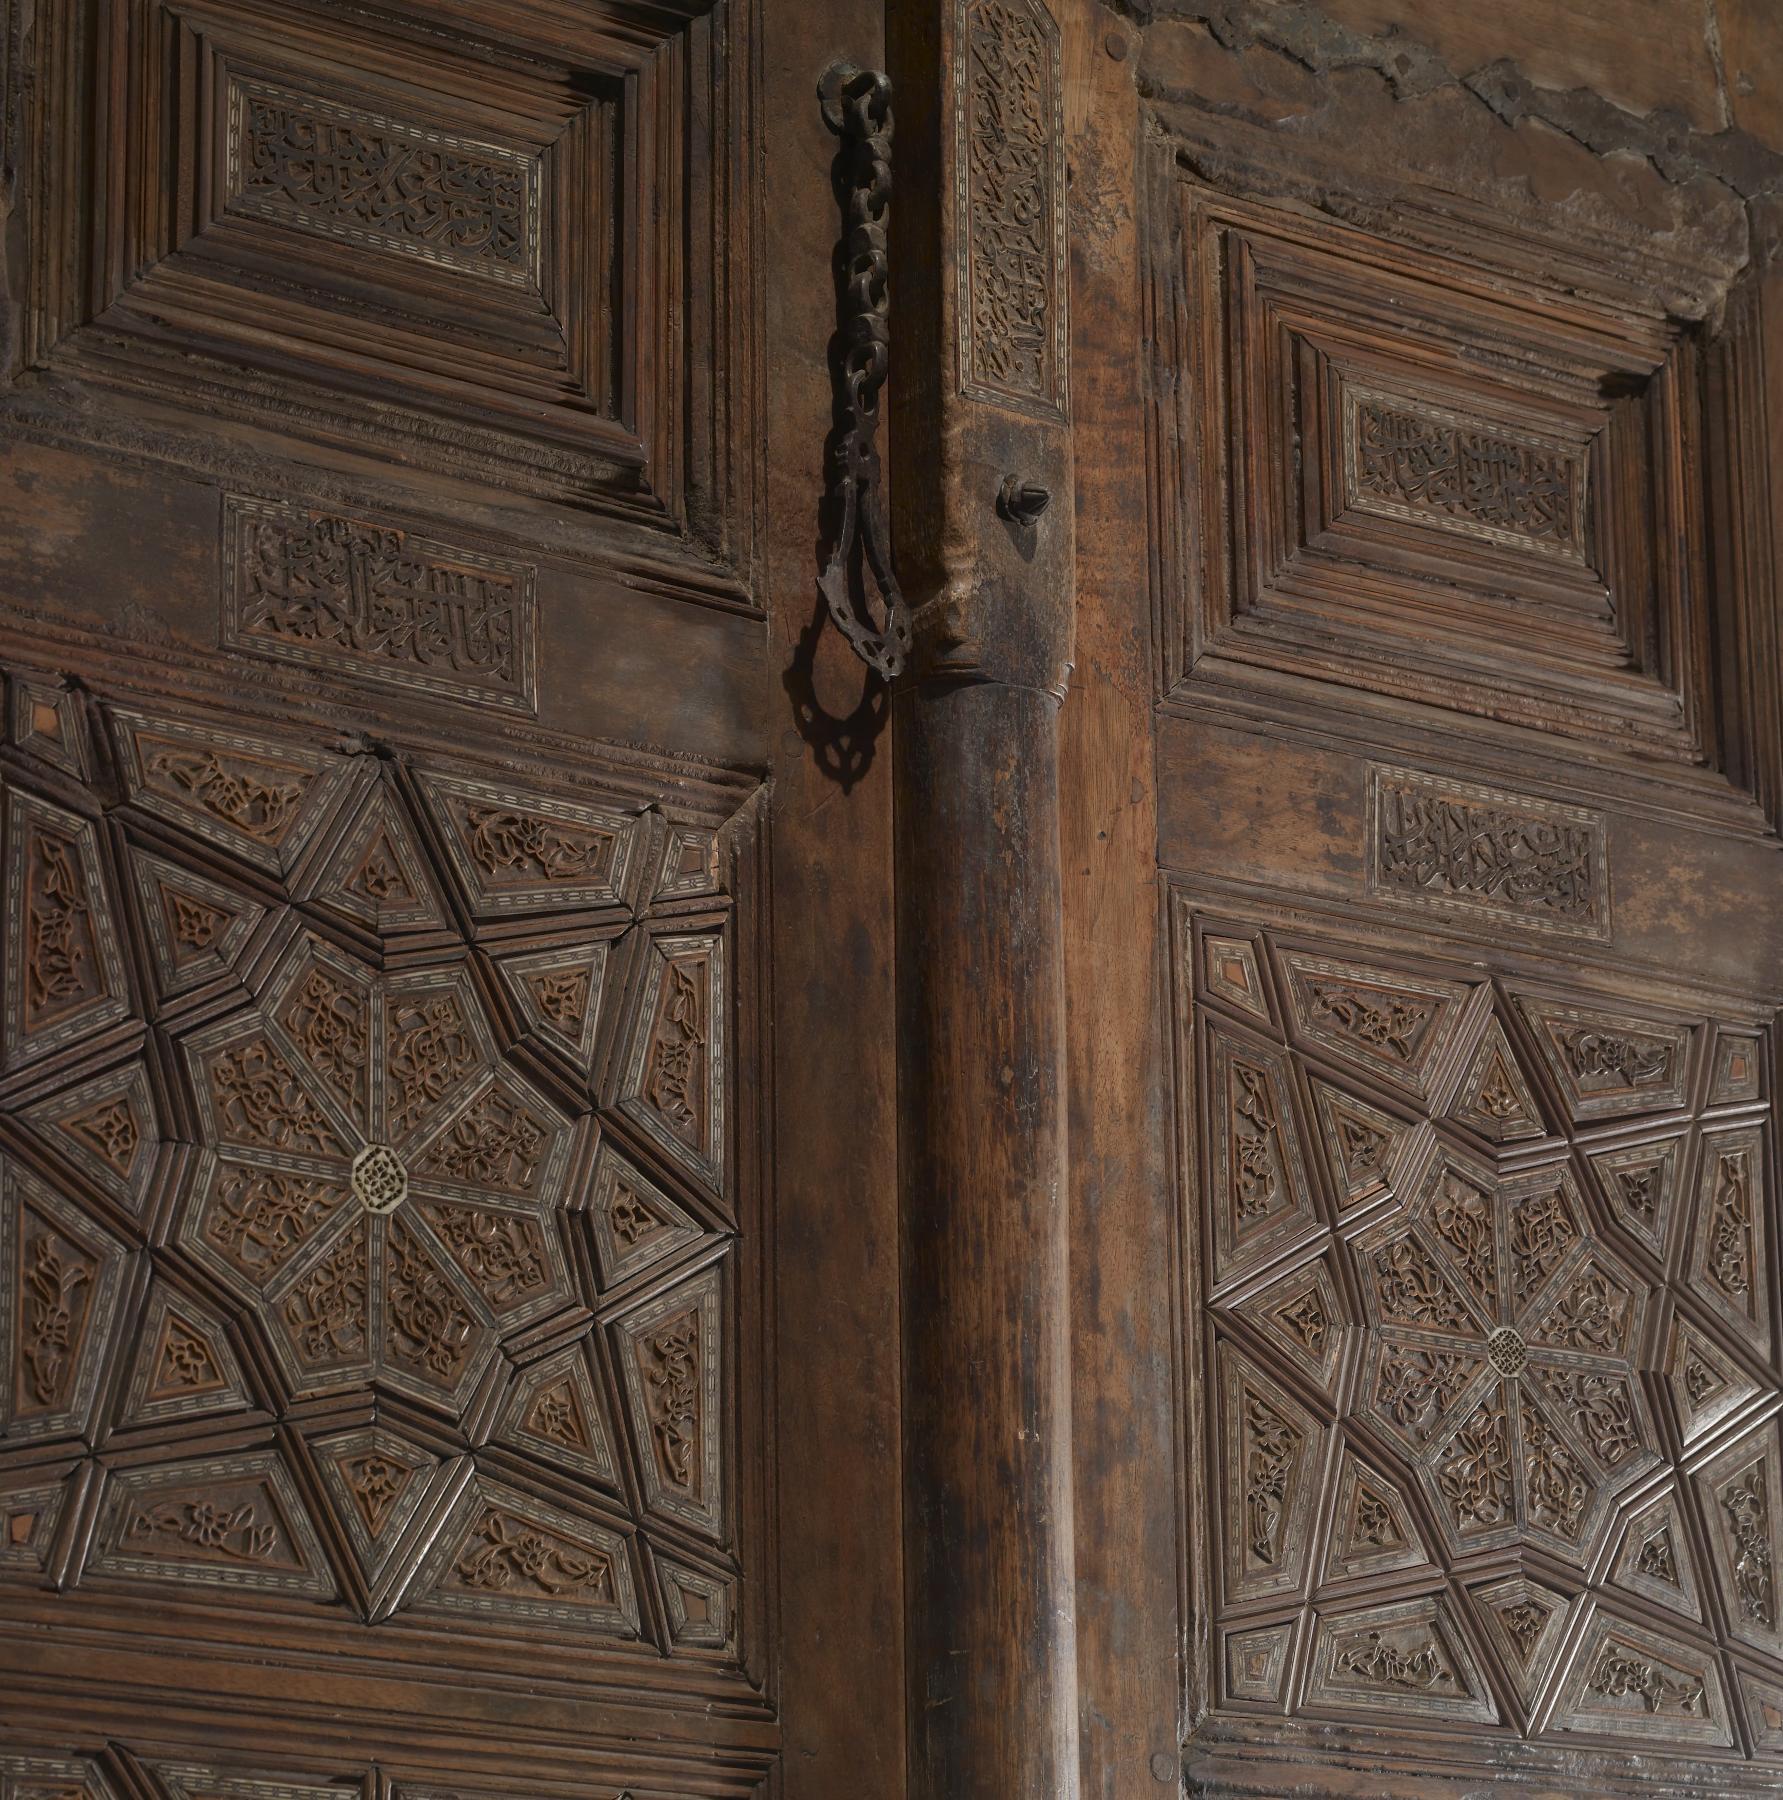 File:Qanbar ibn Mahmud - Mausoleum Doors - Walters 61297 - Detail E.jpg & File:Qanbar ibn Mahmud - Mausoleum Doors - Walters 61297 - Detail ... Pezcame.Com